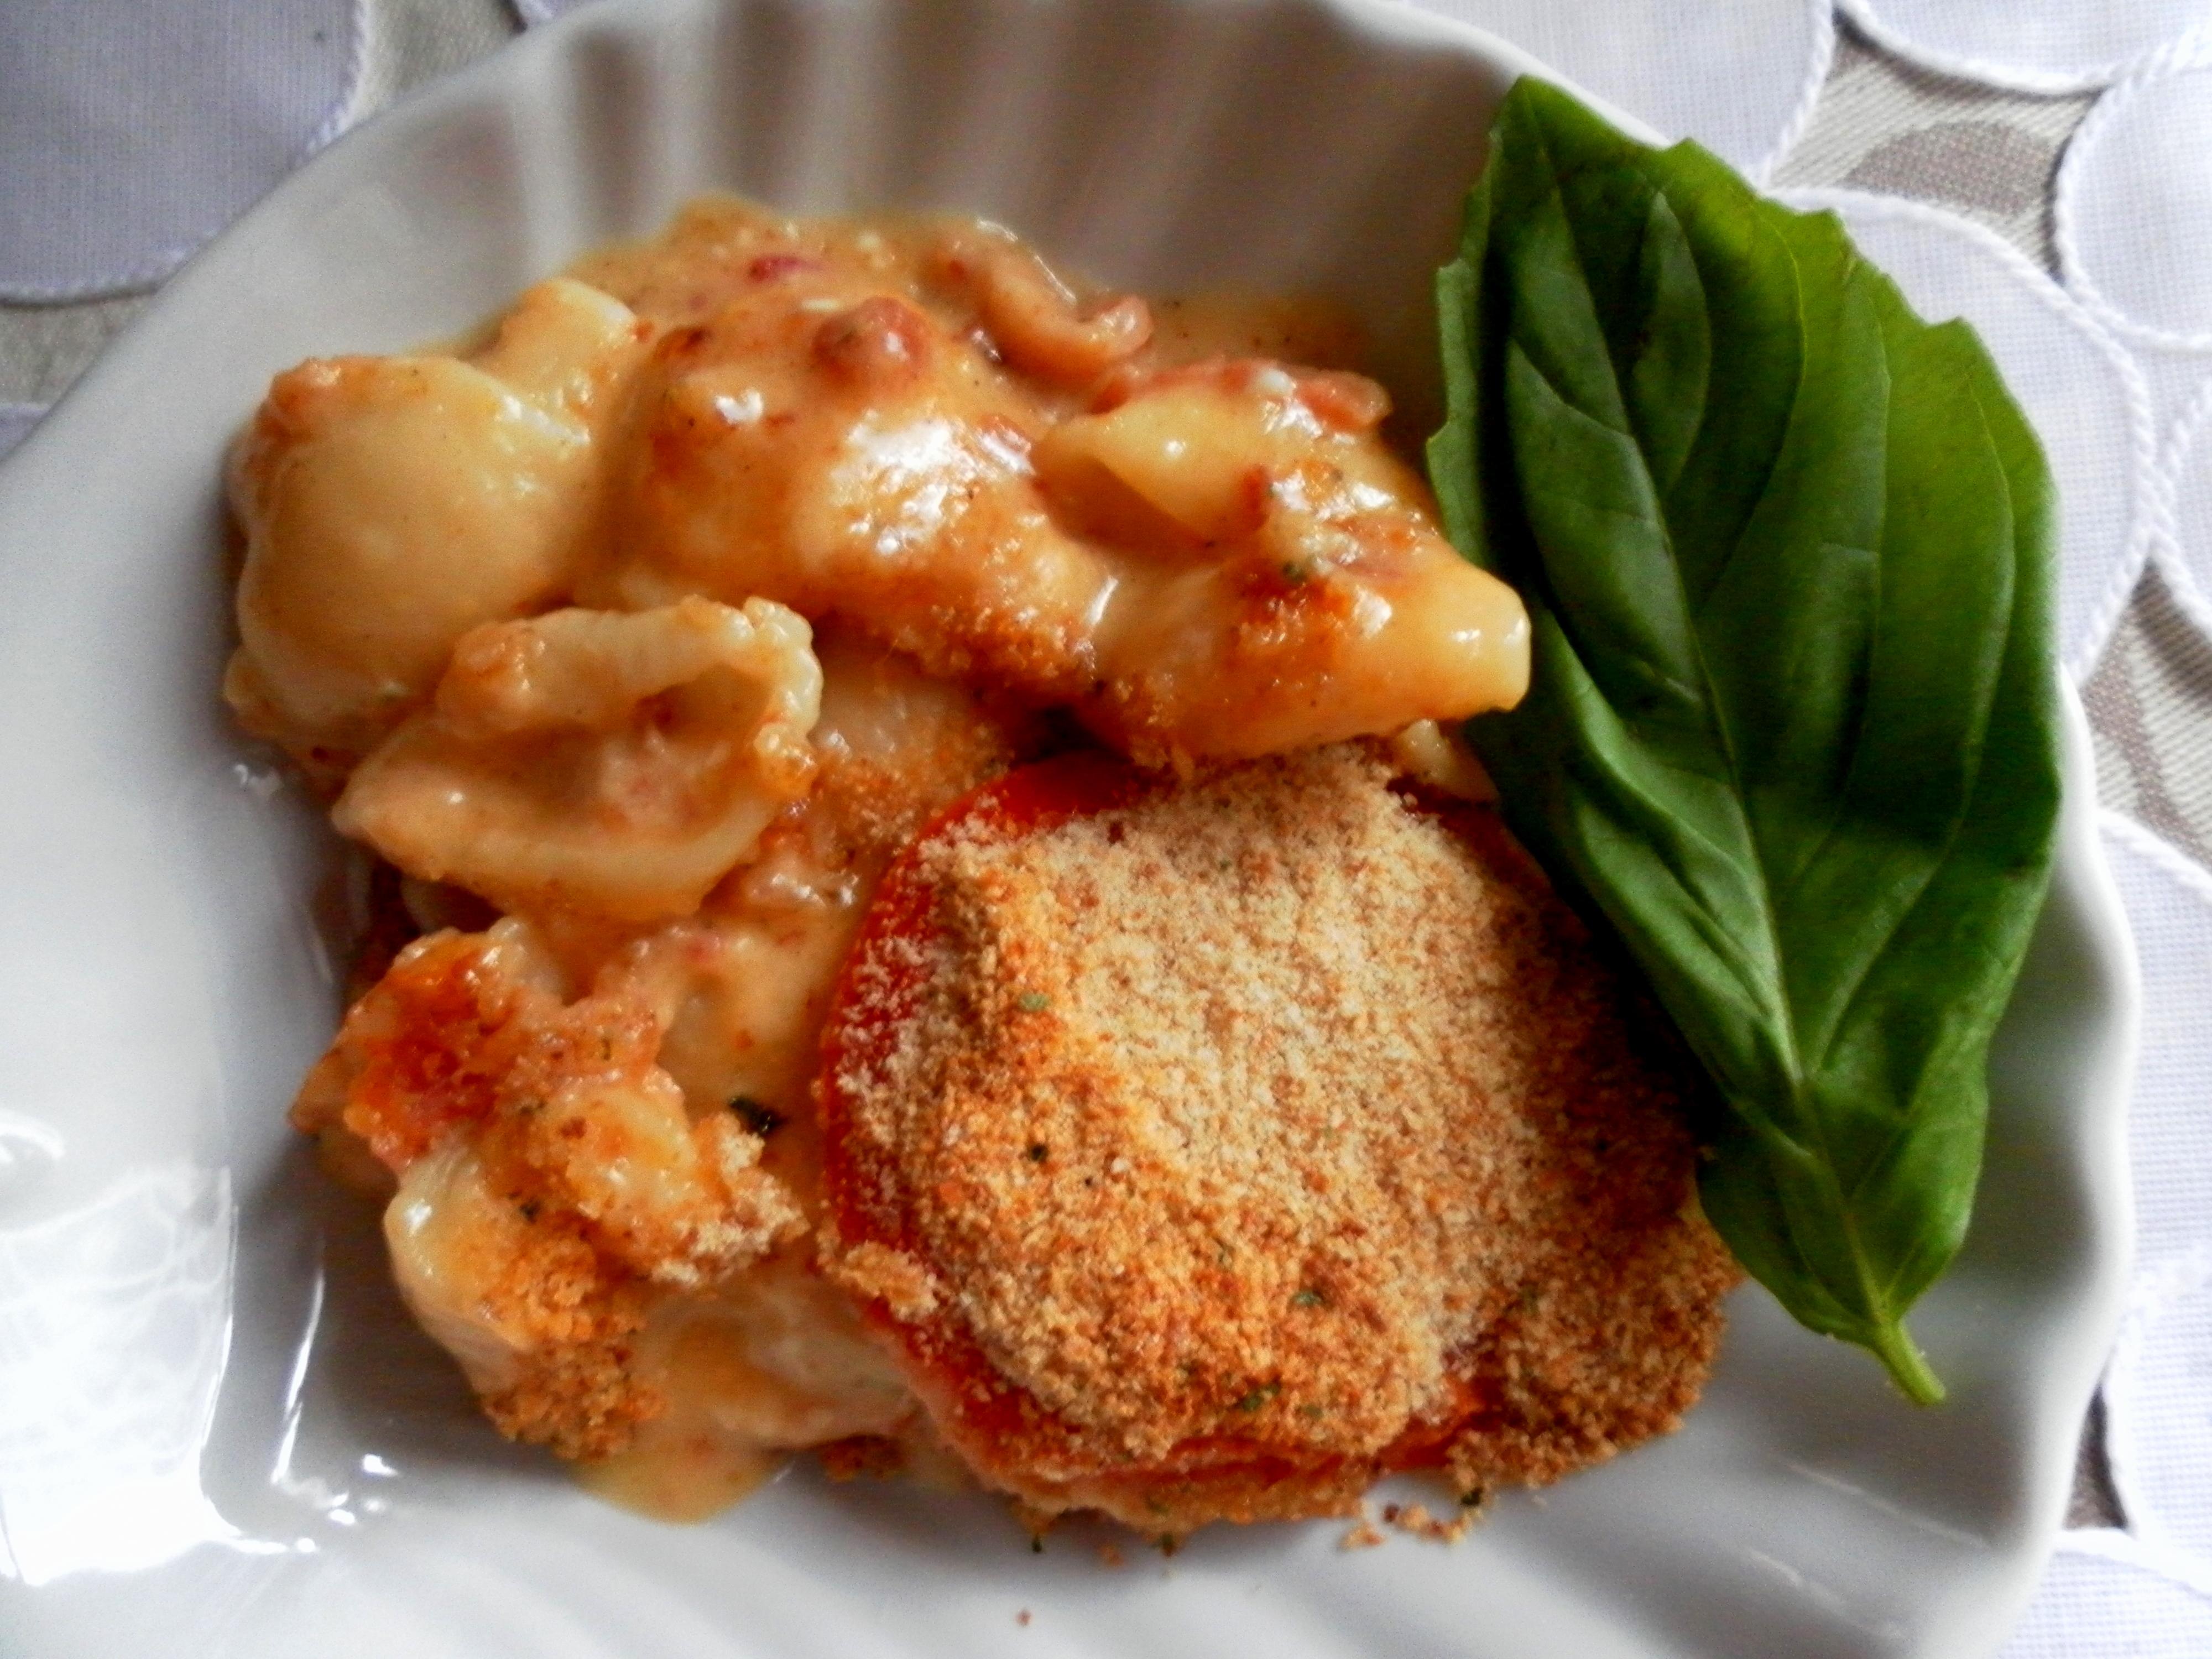 inas mac n cheese 003 So for my Wild Card* choice this week, I made Ina's Grown Up Mac and Cheese.